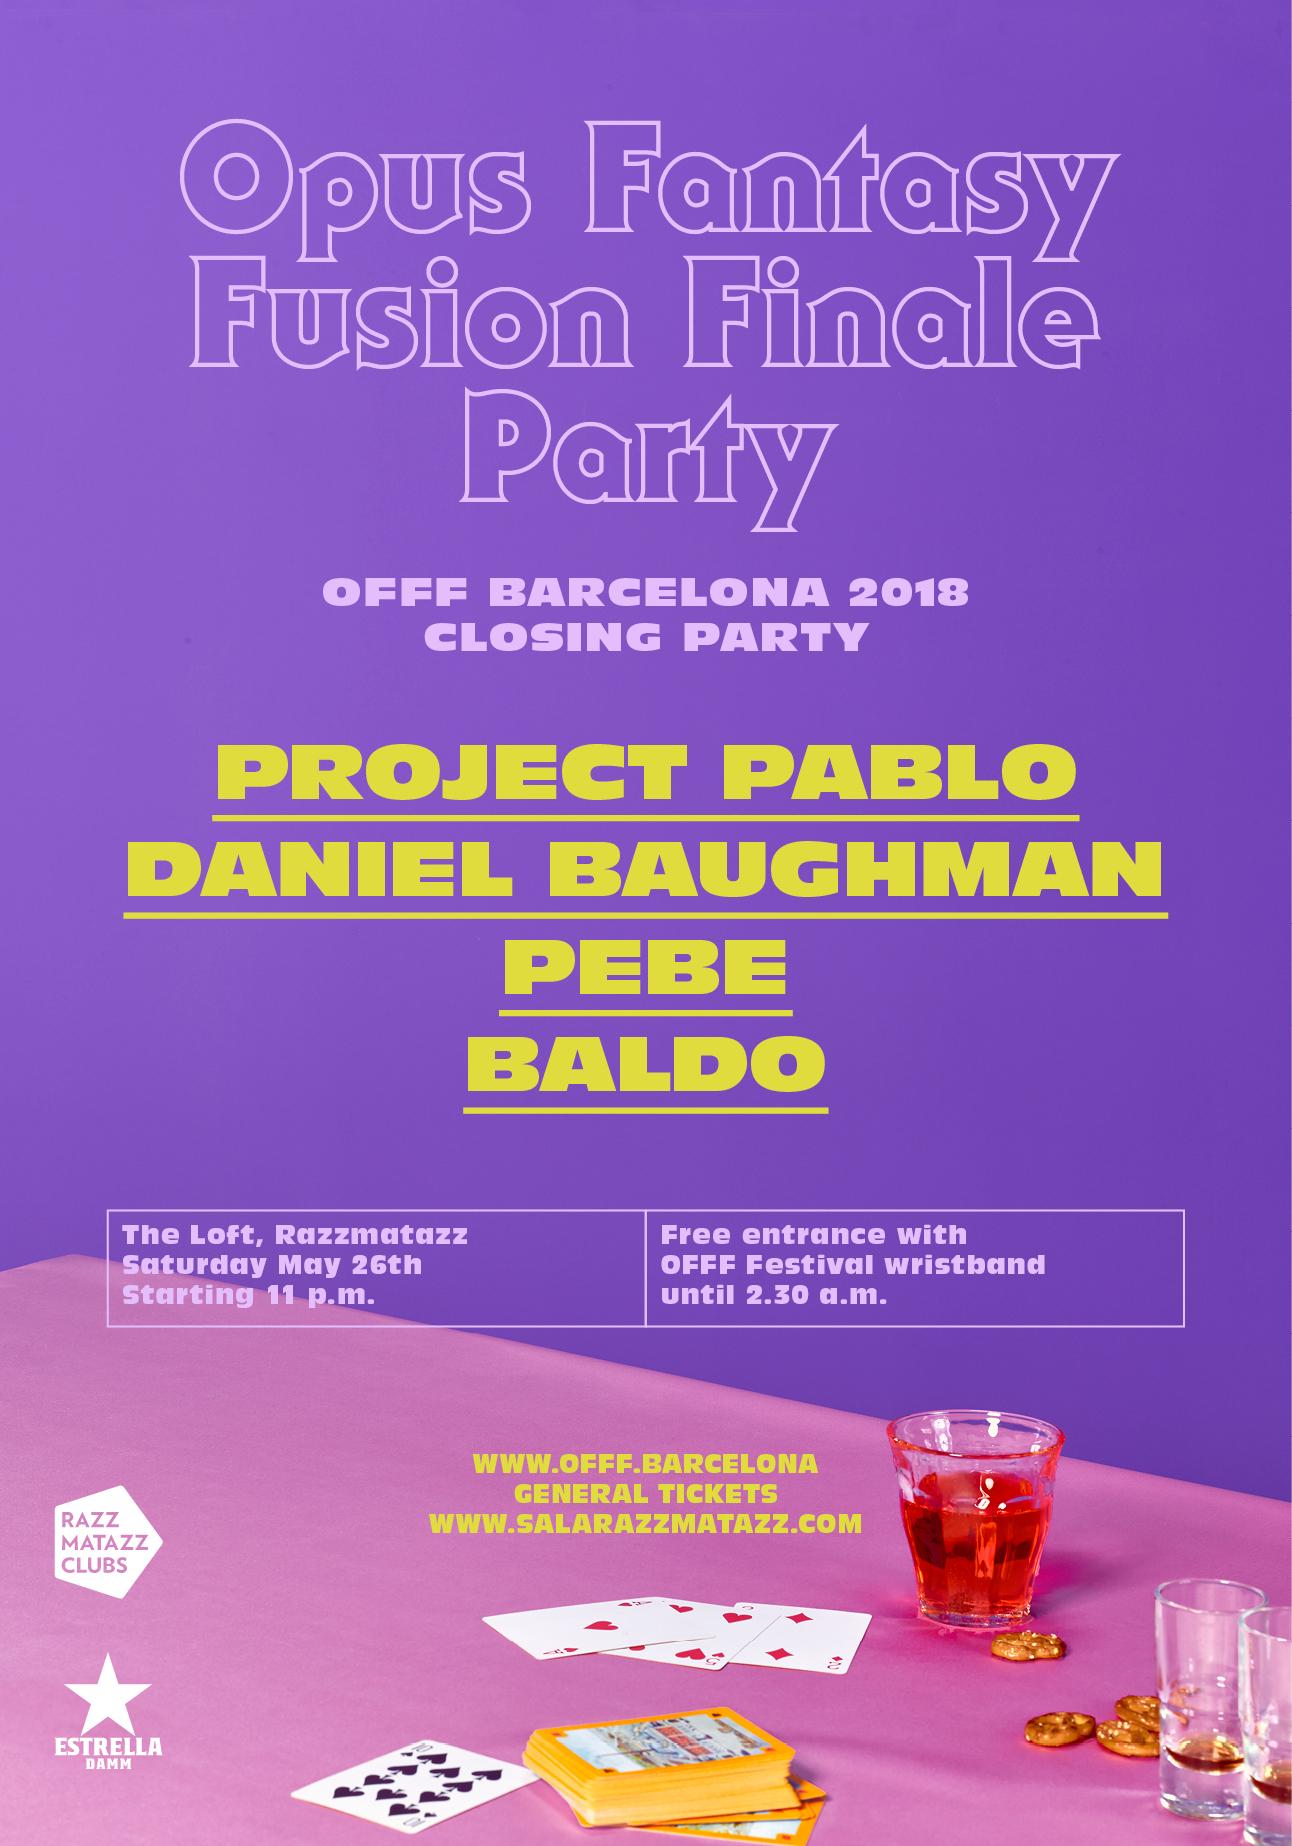 Opus Fantasy Fusion Finale Party: Project Pablo + Daniel